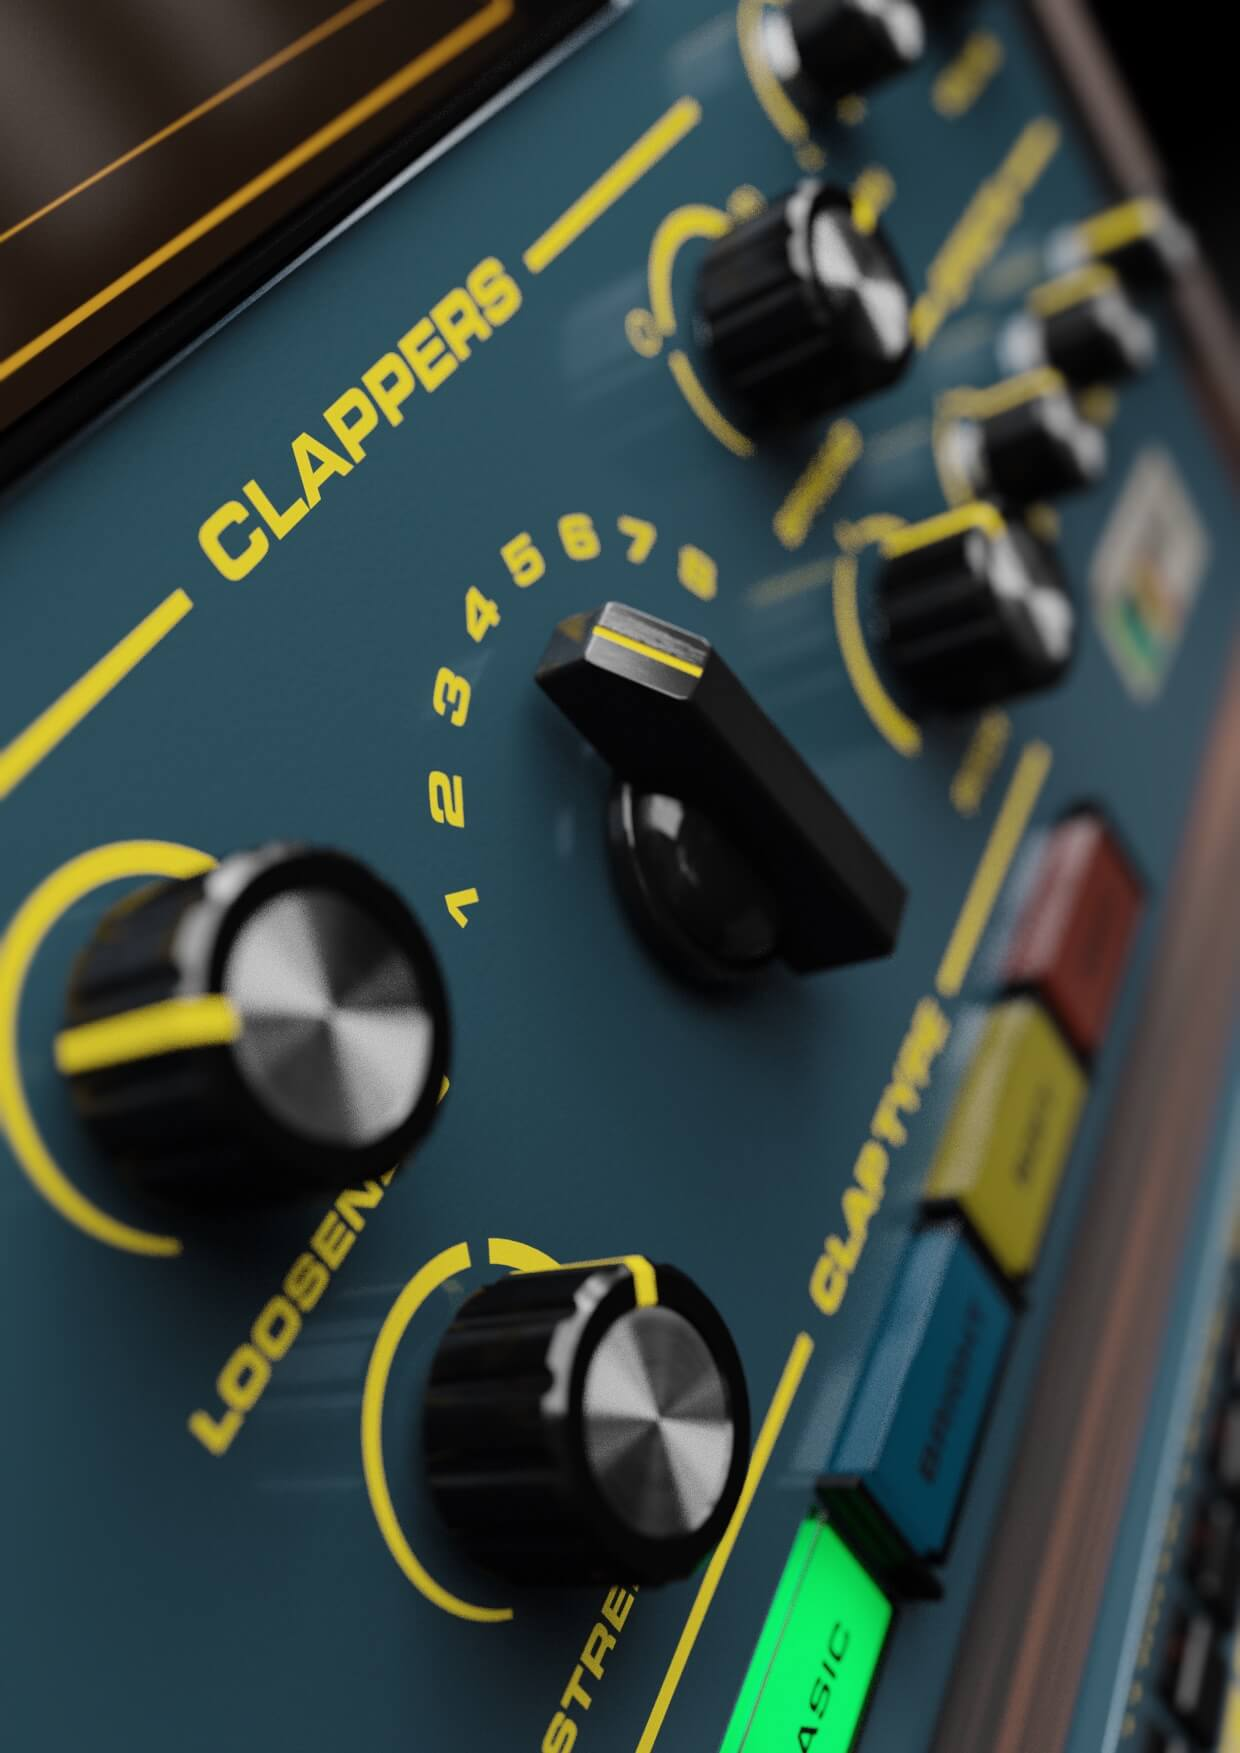 Robotic Bean releases Hand Clap Studio sample-based claps